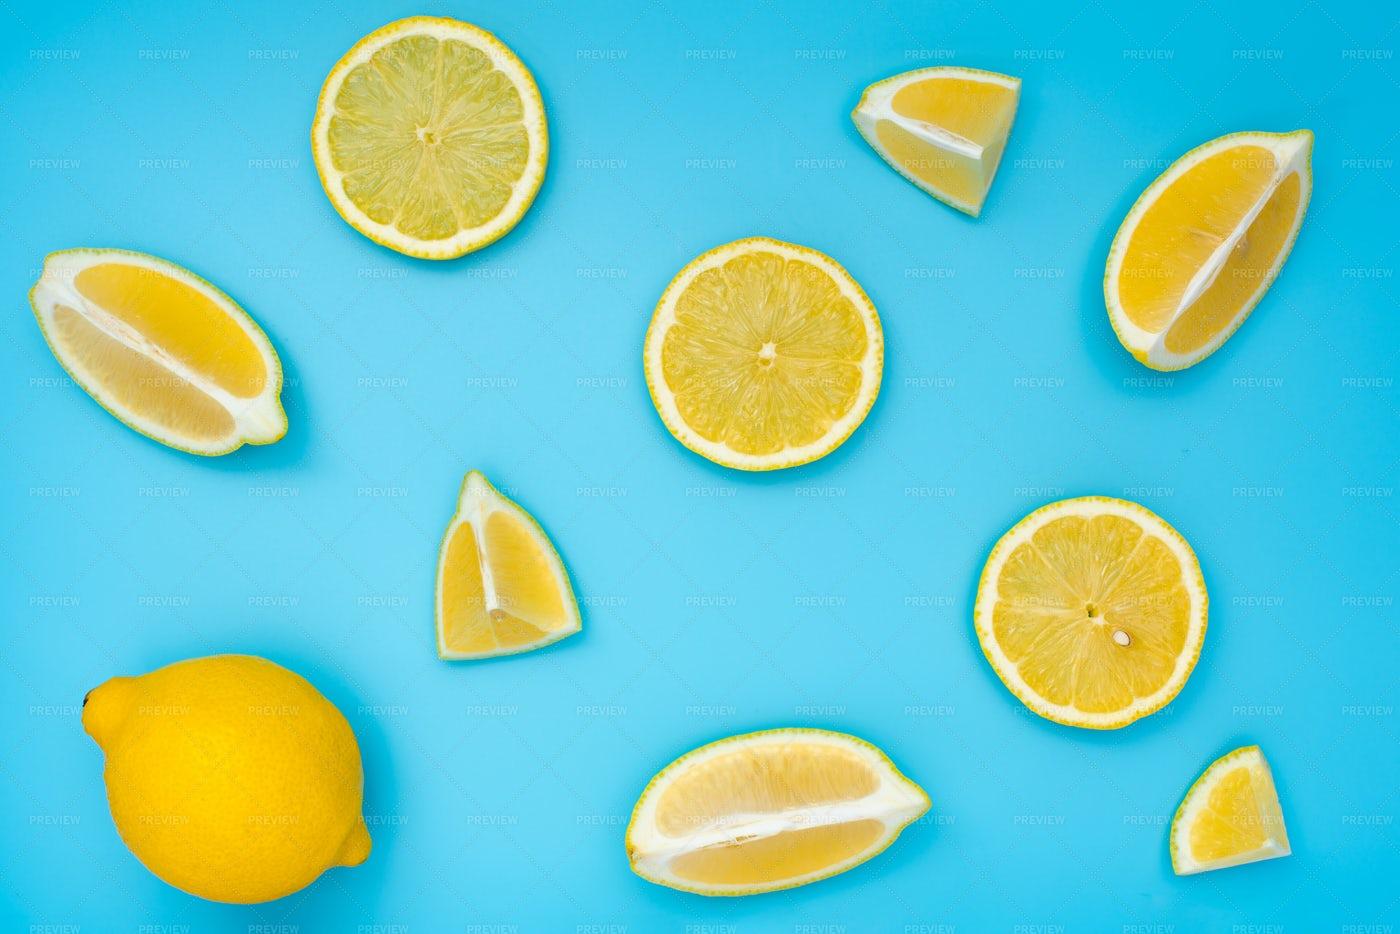 Variety Of Lemon Slices On Blue: Stock Photos